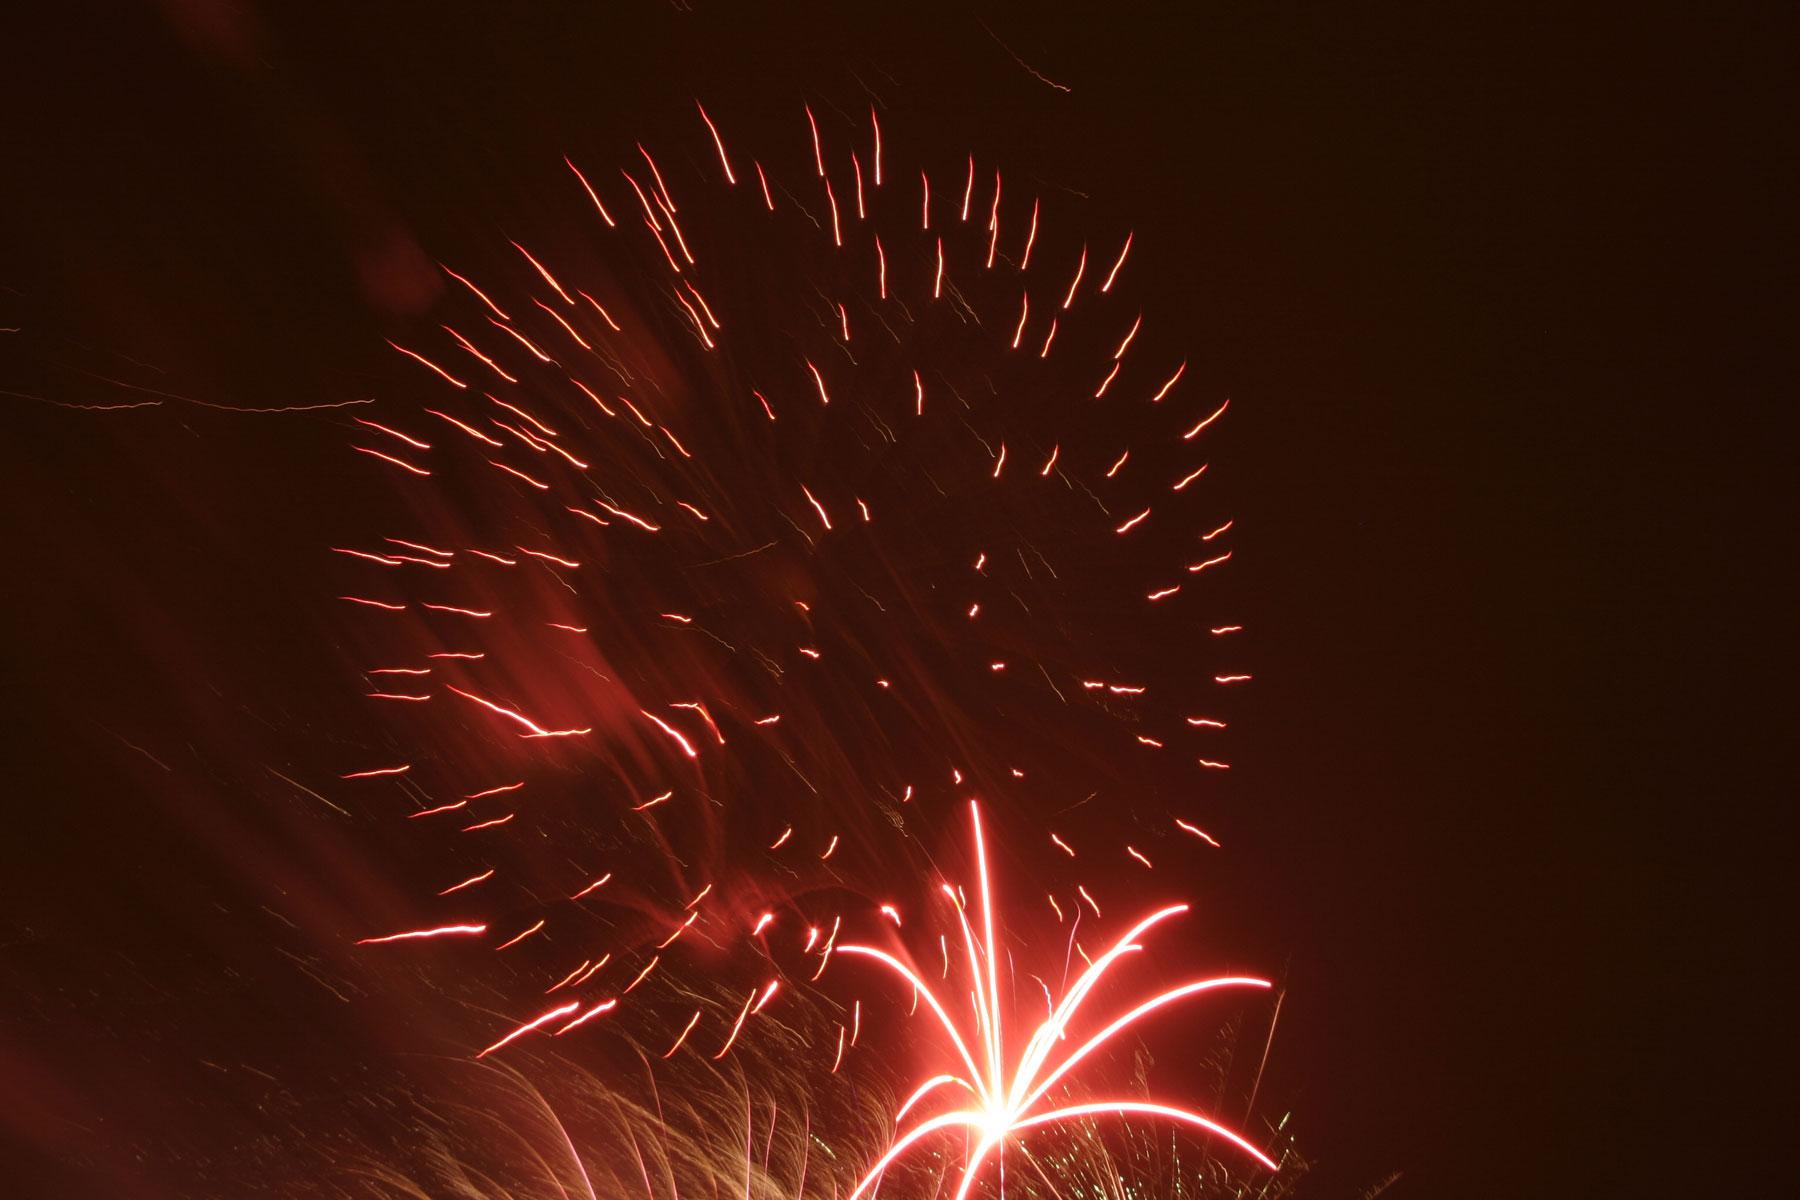 Fireworks, Blast, Blowup, Bomb, Celebrate, HQ Photo